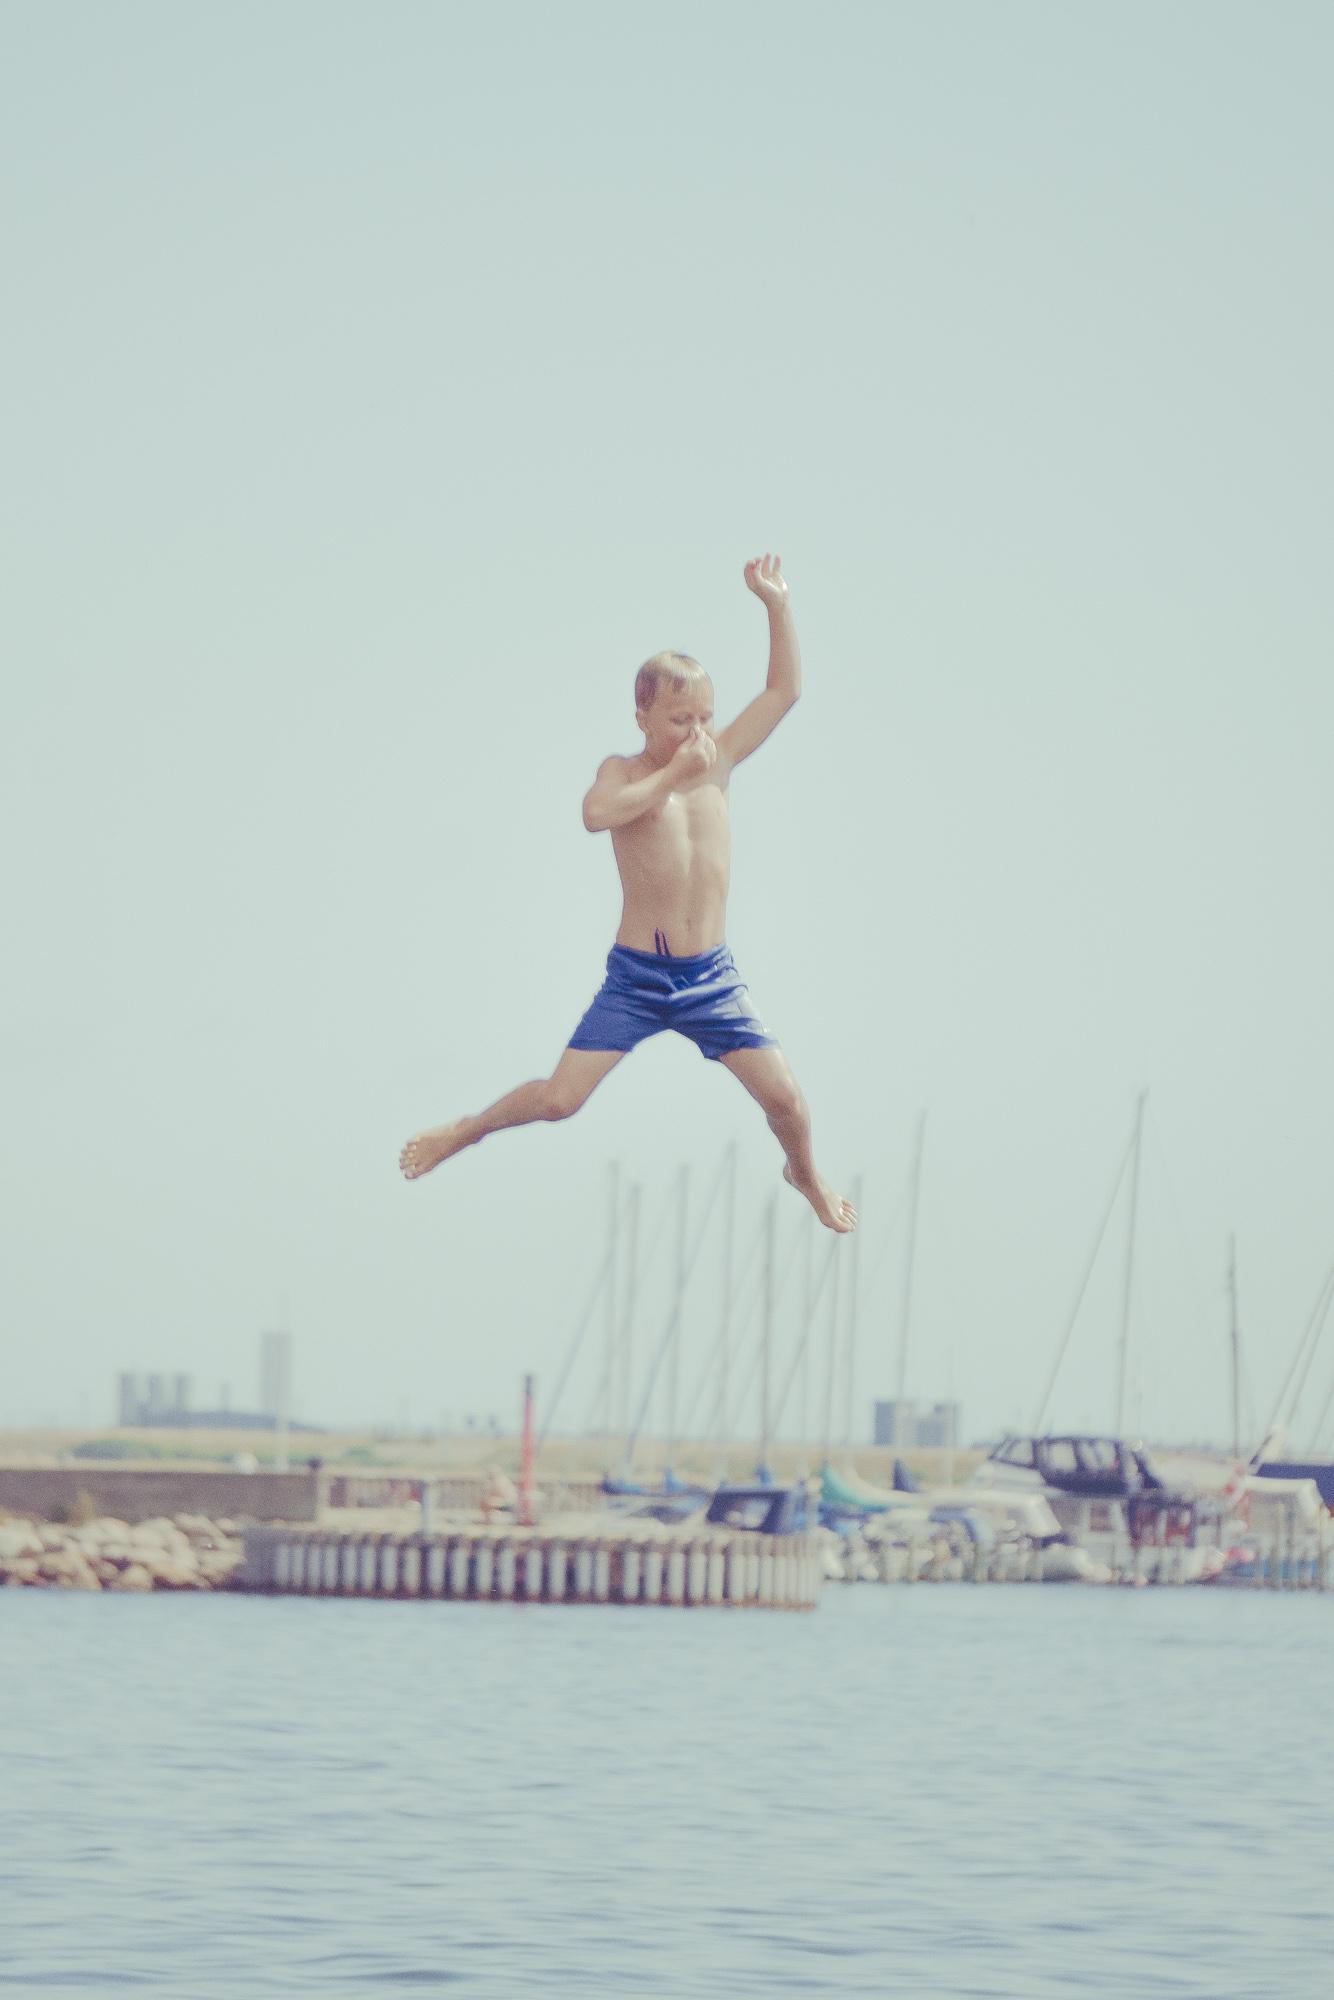 The Hottest Summer-2.jpg